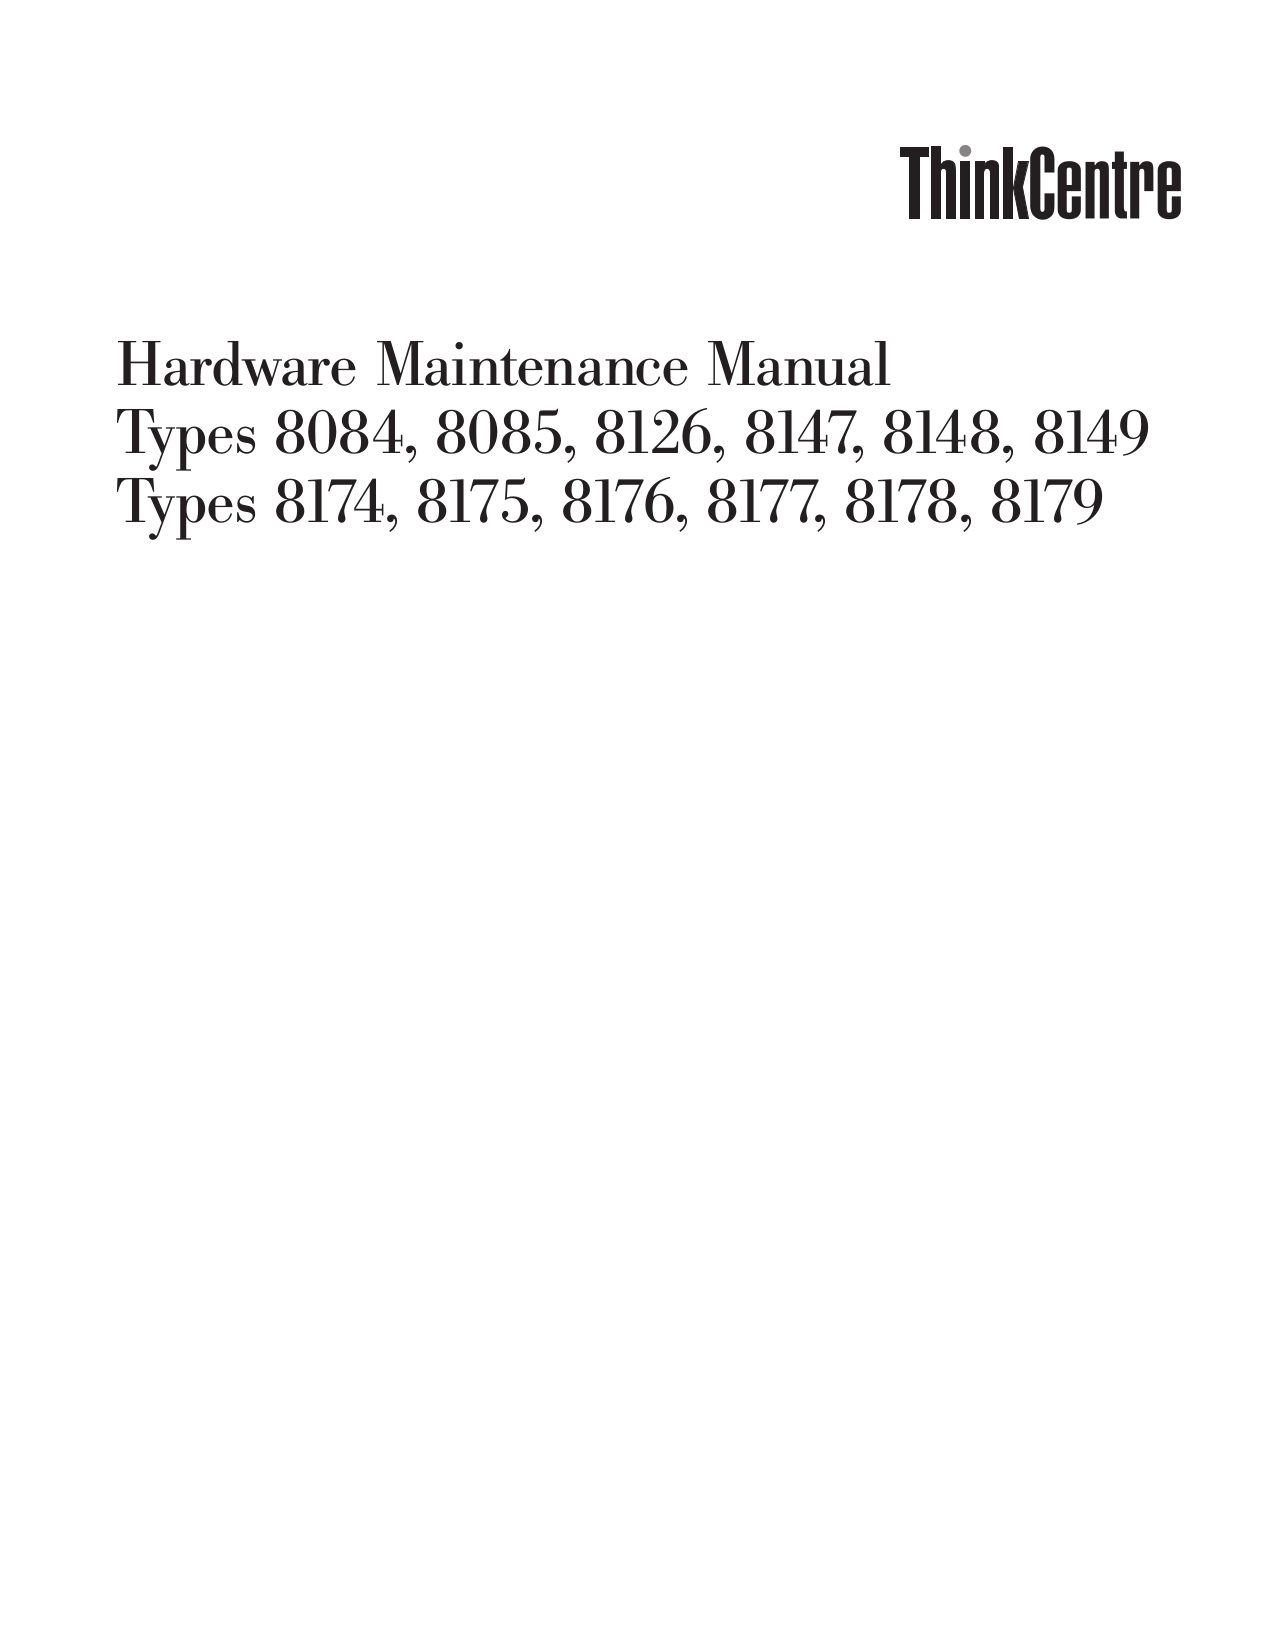 pdf for Lenovo Desktop ThinkCentre A50 8177 manual